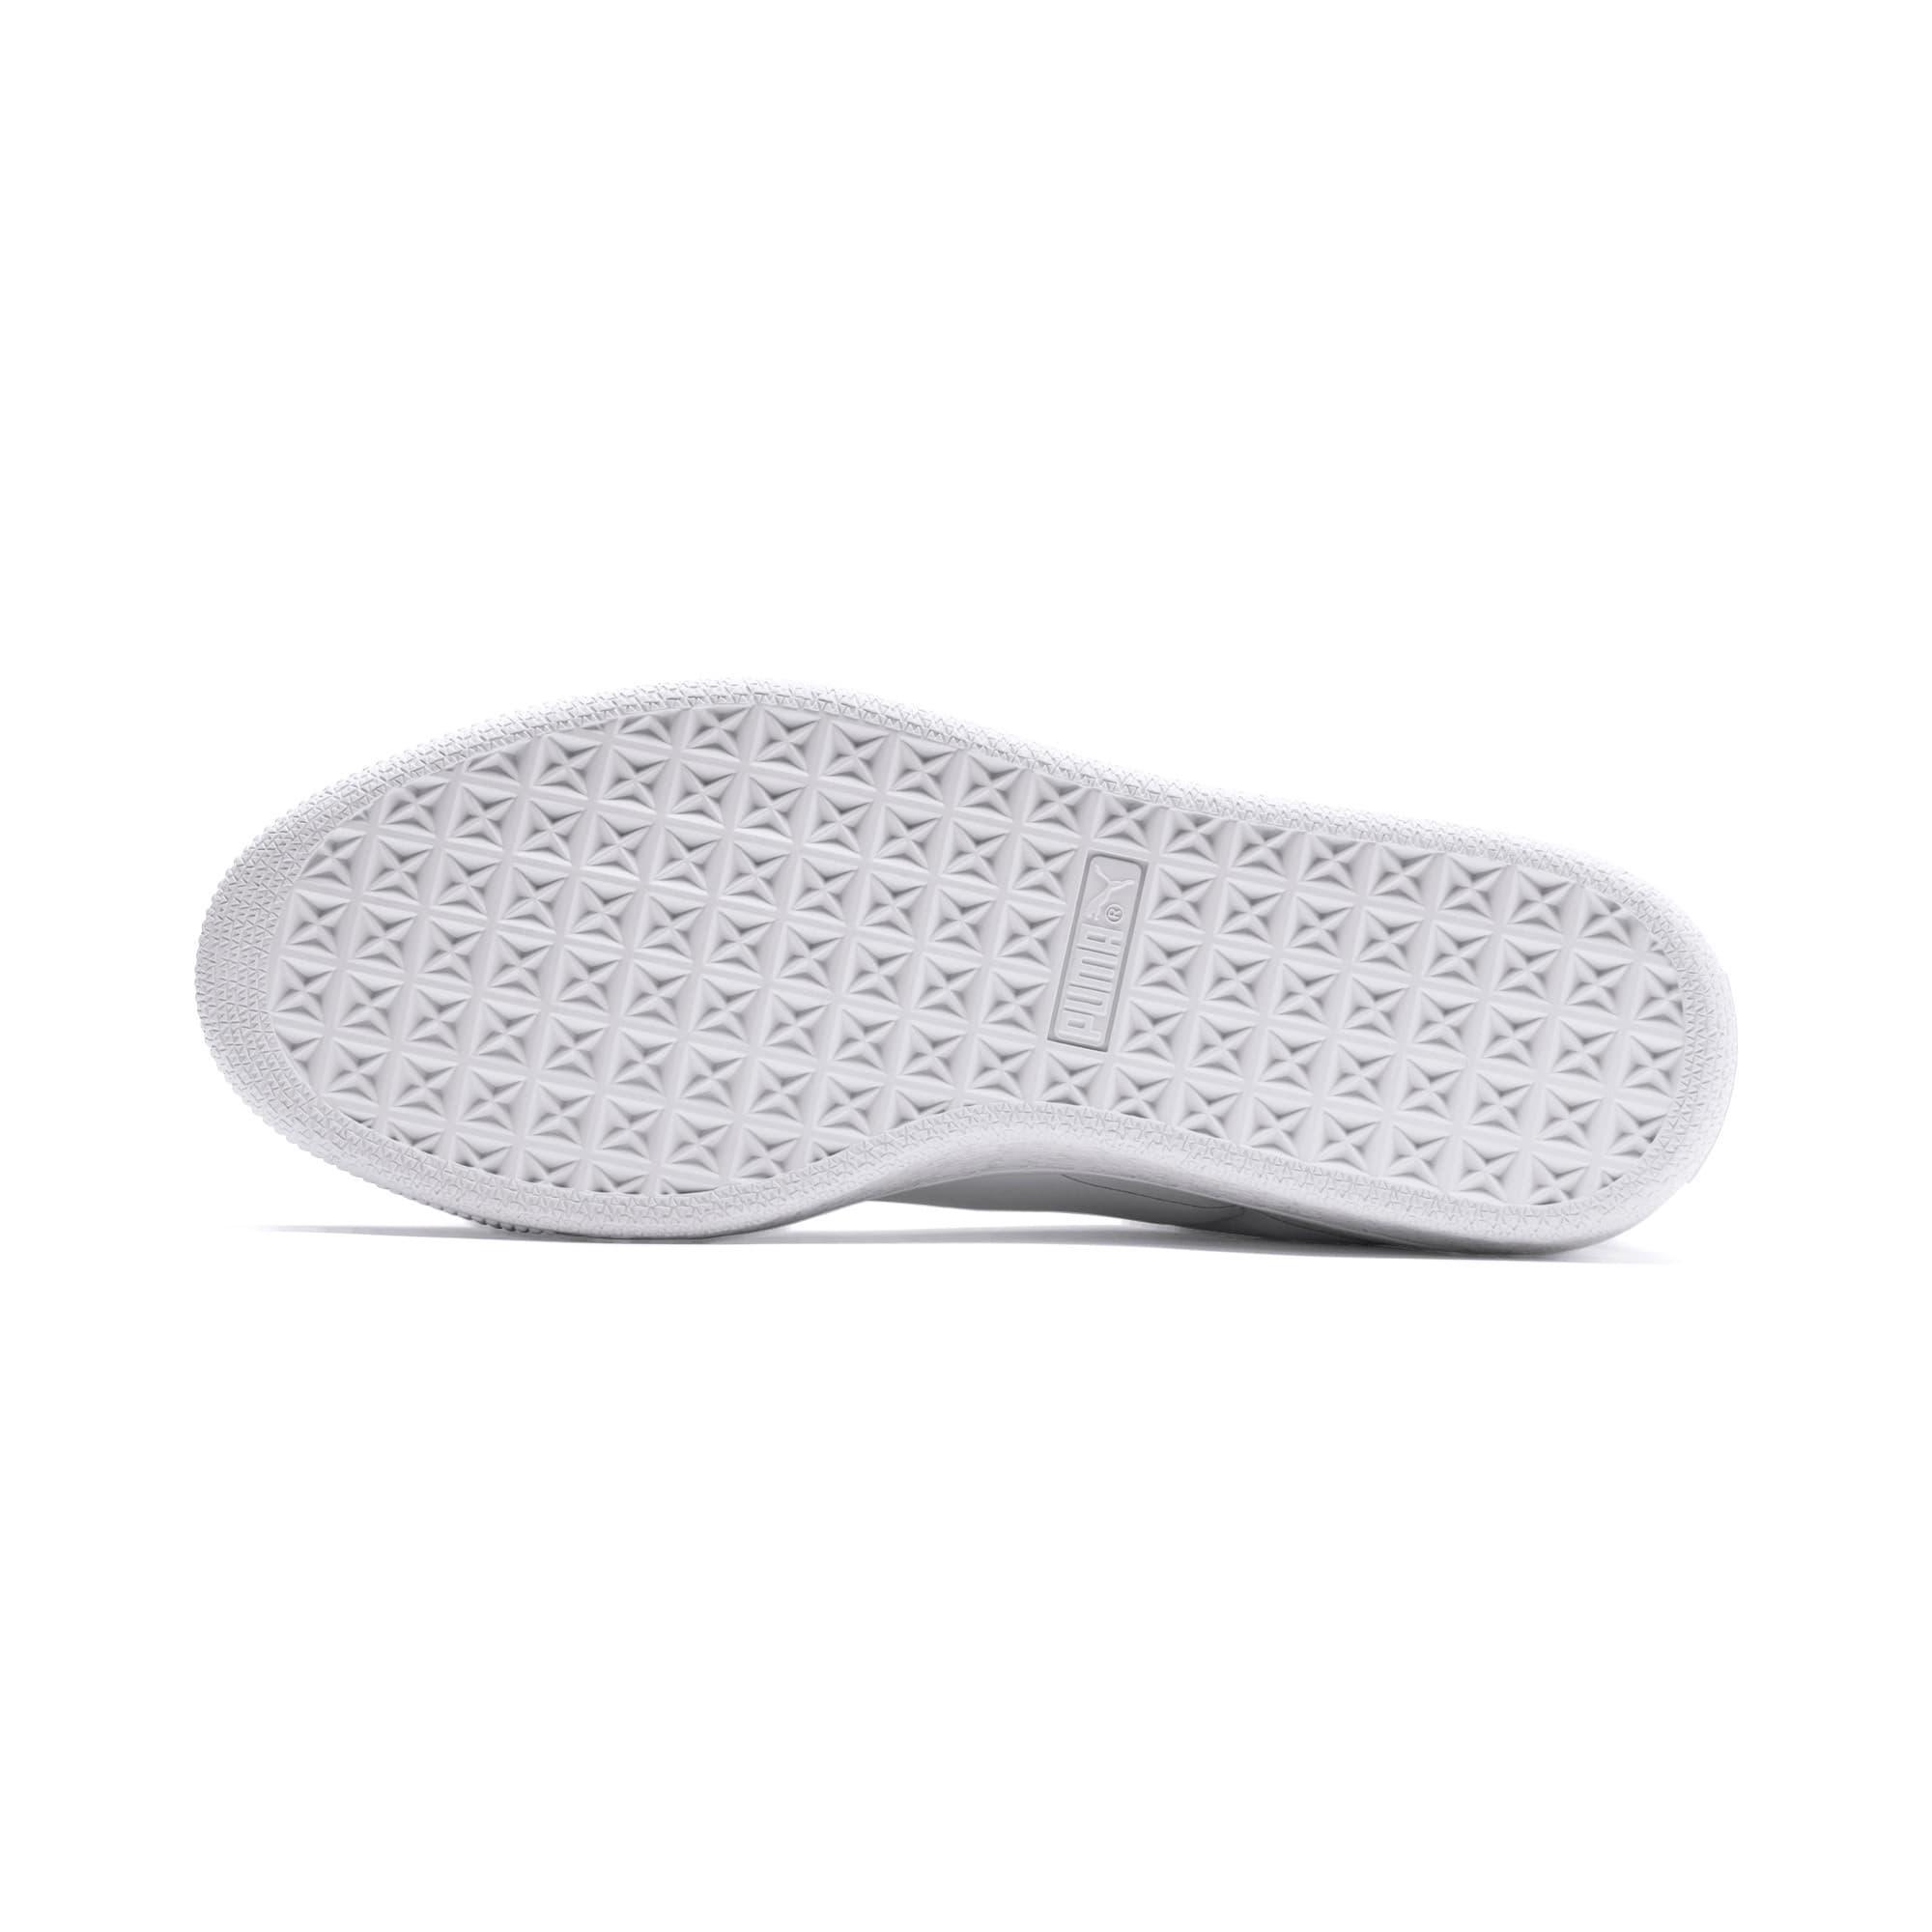 Miniatura 3 de Zapatos deportivos  Basket Trailblazerpara mujer, Puma White-Fuchsia Purple, mediano